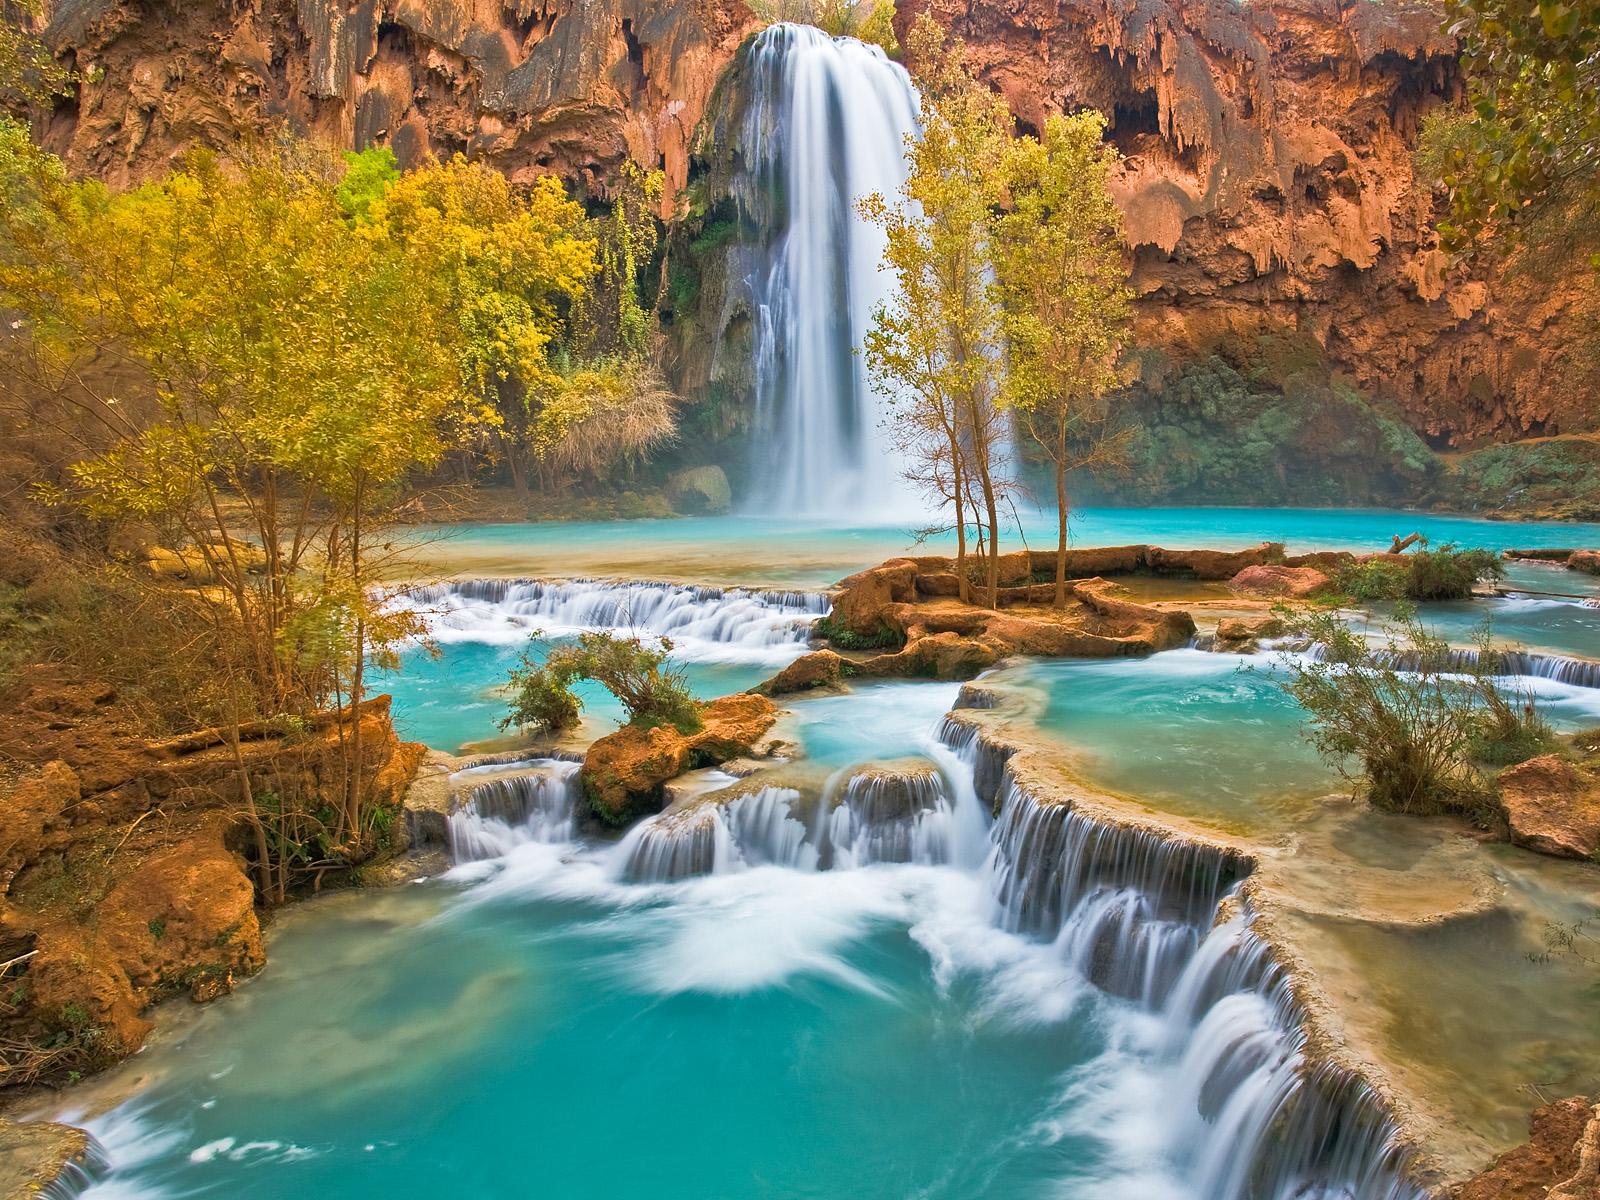 Havasu Falls Arizona Wallpapers Full Desktop Backgrounds 1600x1200